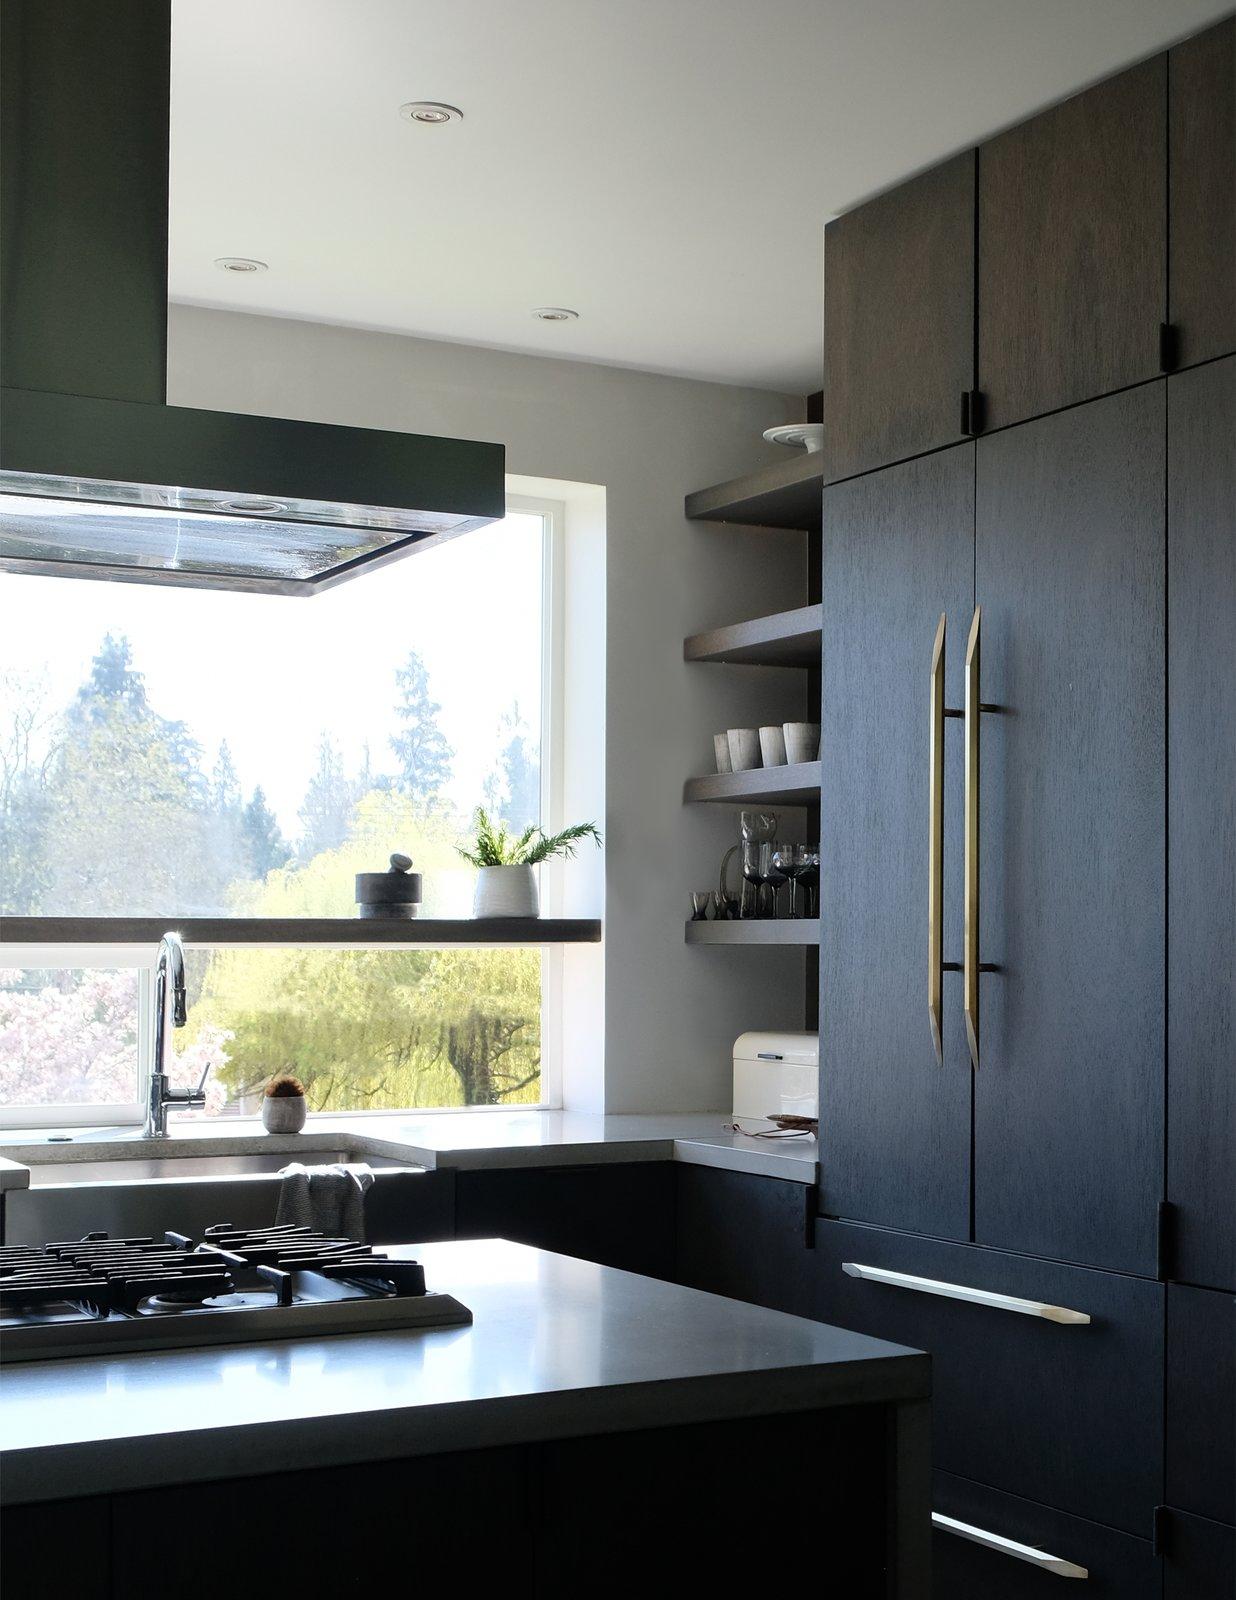 Midcentury Kitchen Remodel by Mutuus Studio